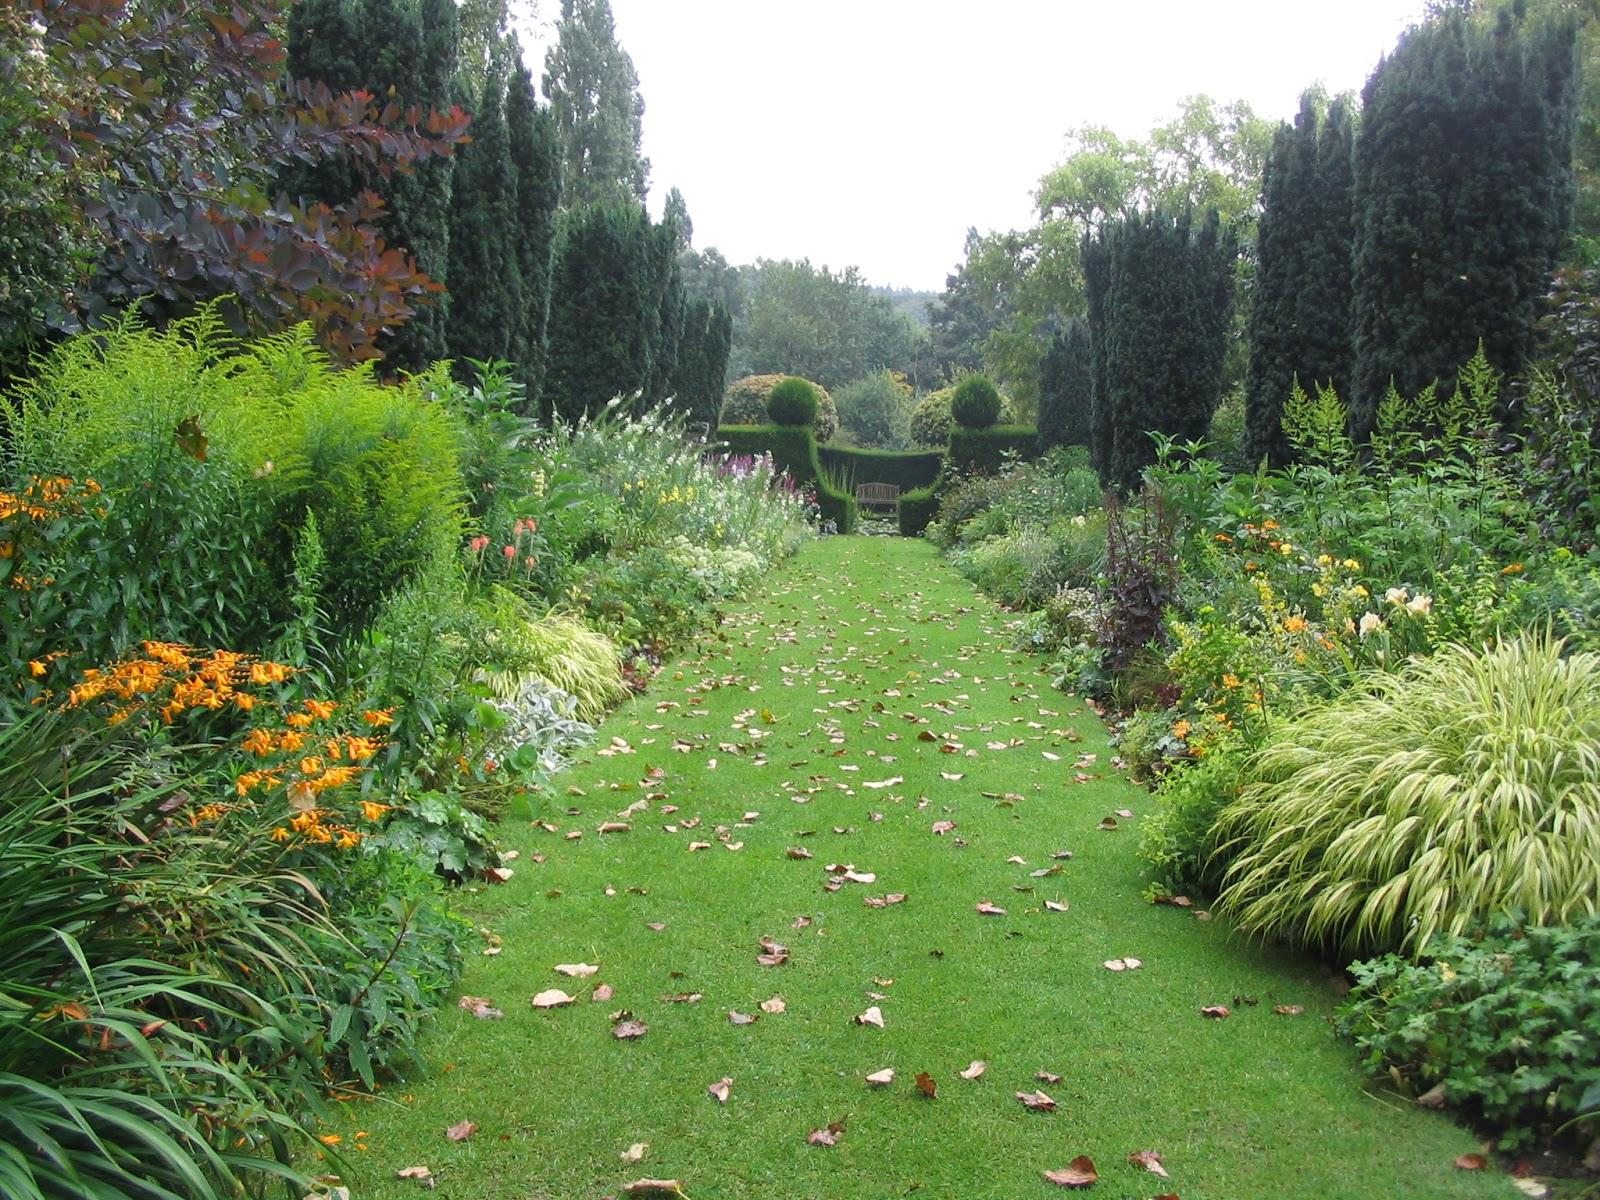 Le jardin de brigitte alsace le jardin de castillon - Les jardins d alsace ...